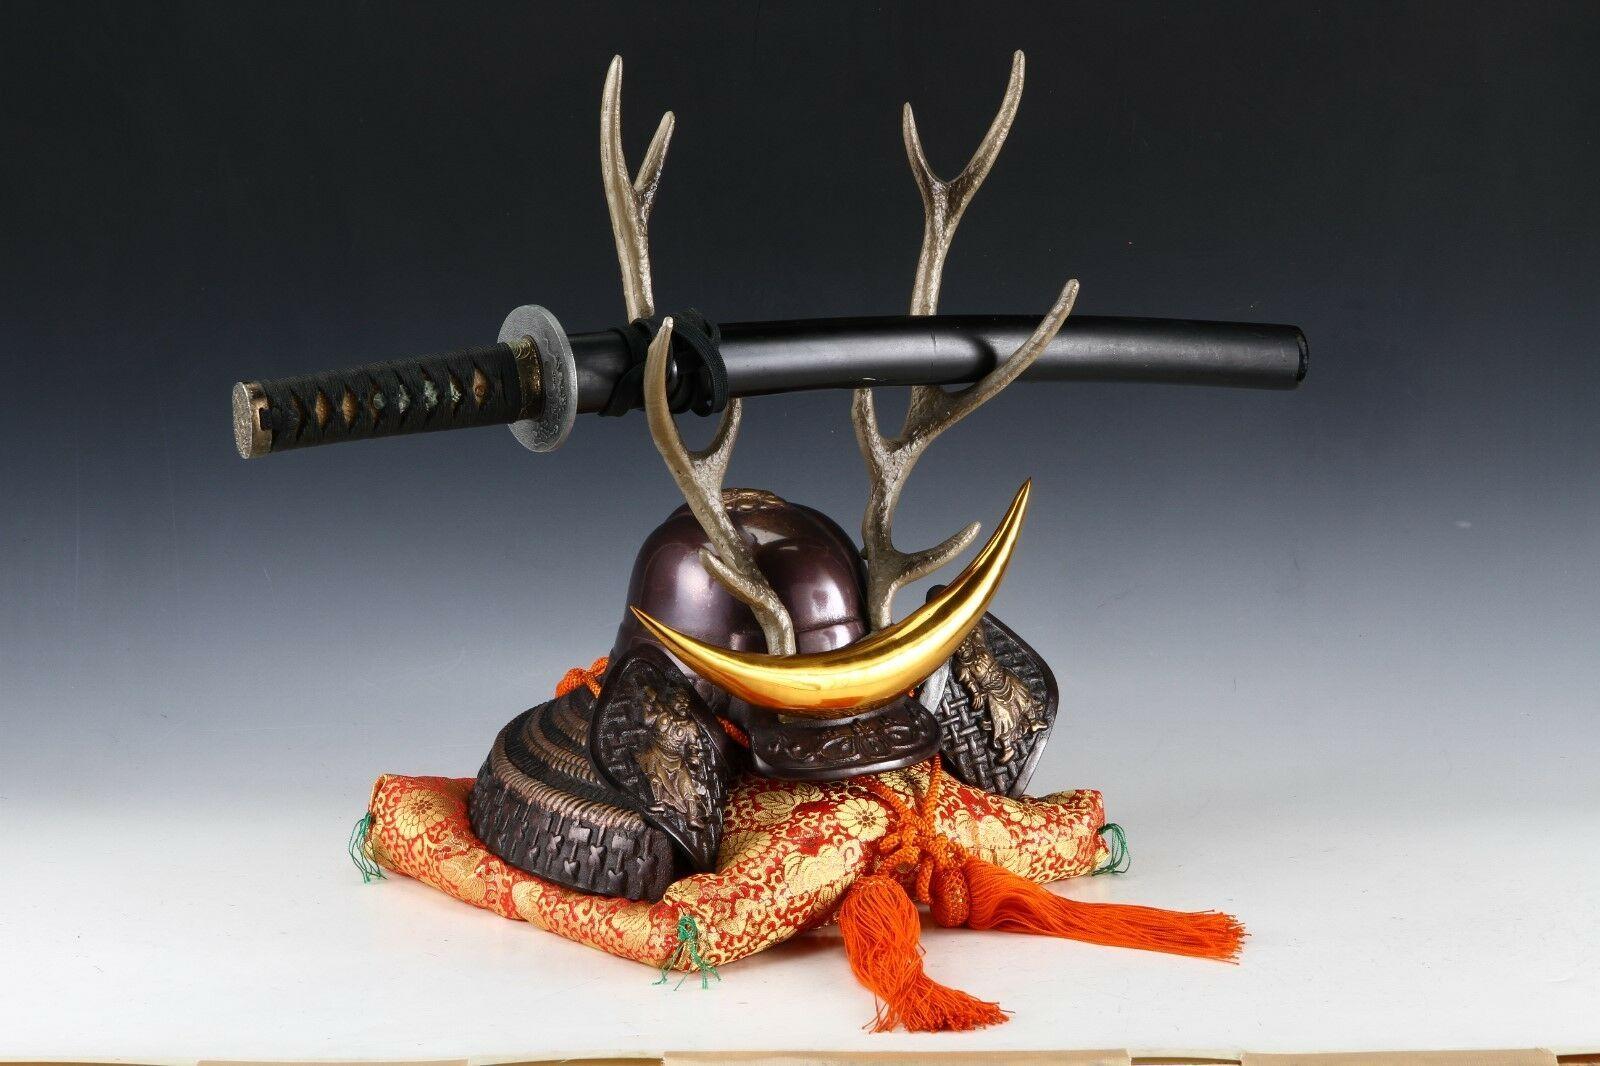 Japanese Beautiful Samurai Helmet -shikanosuke kabuto- with a Replica Blade